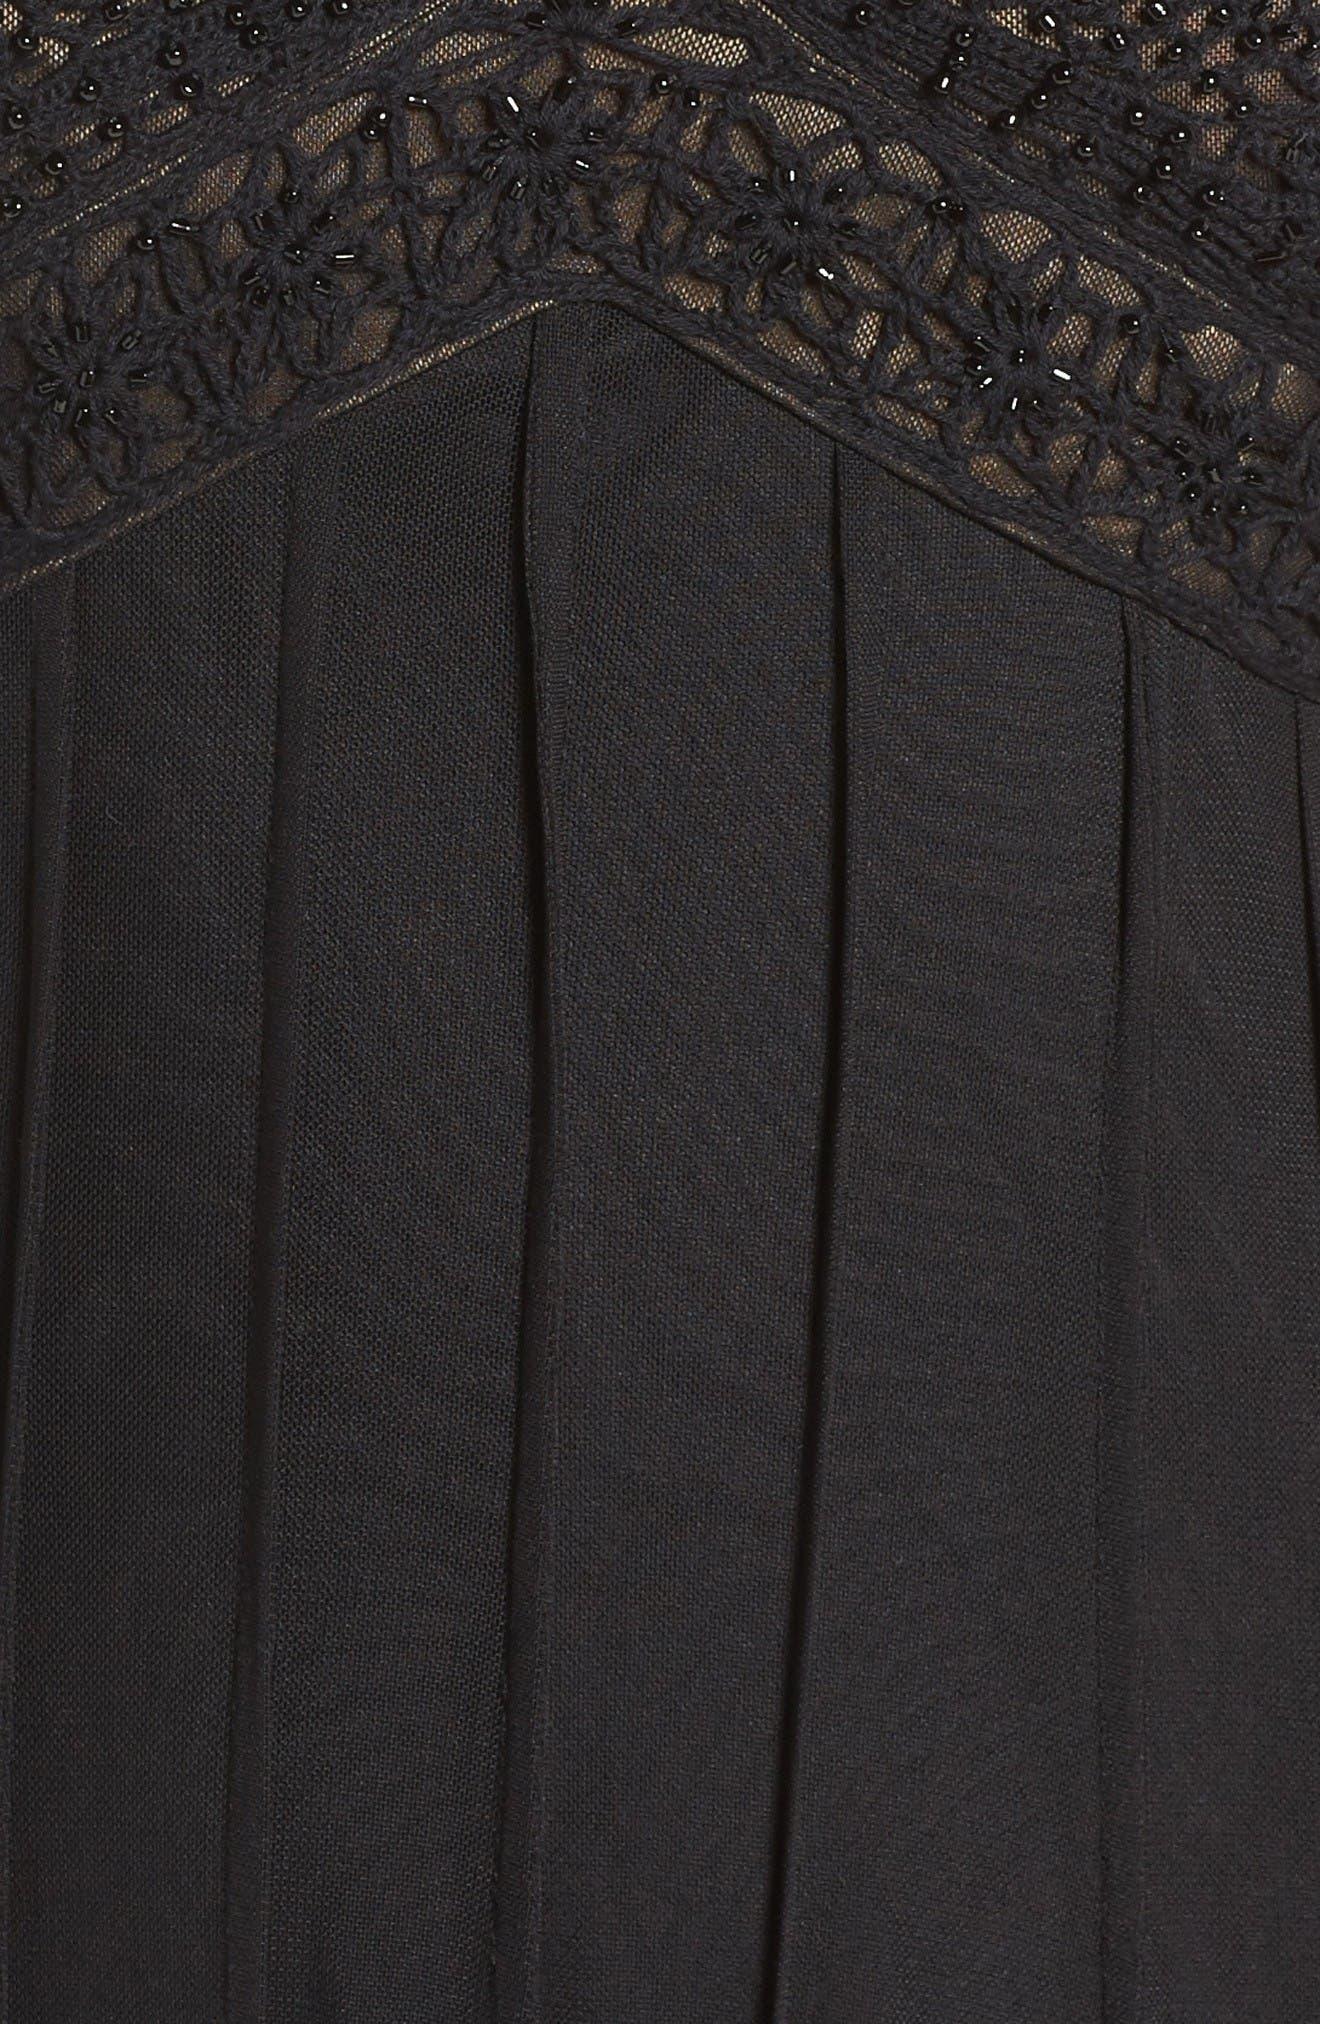 Beaded A-Line Dress,                             Alternate thumbnail 5, color,                             Black